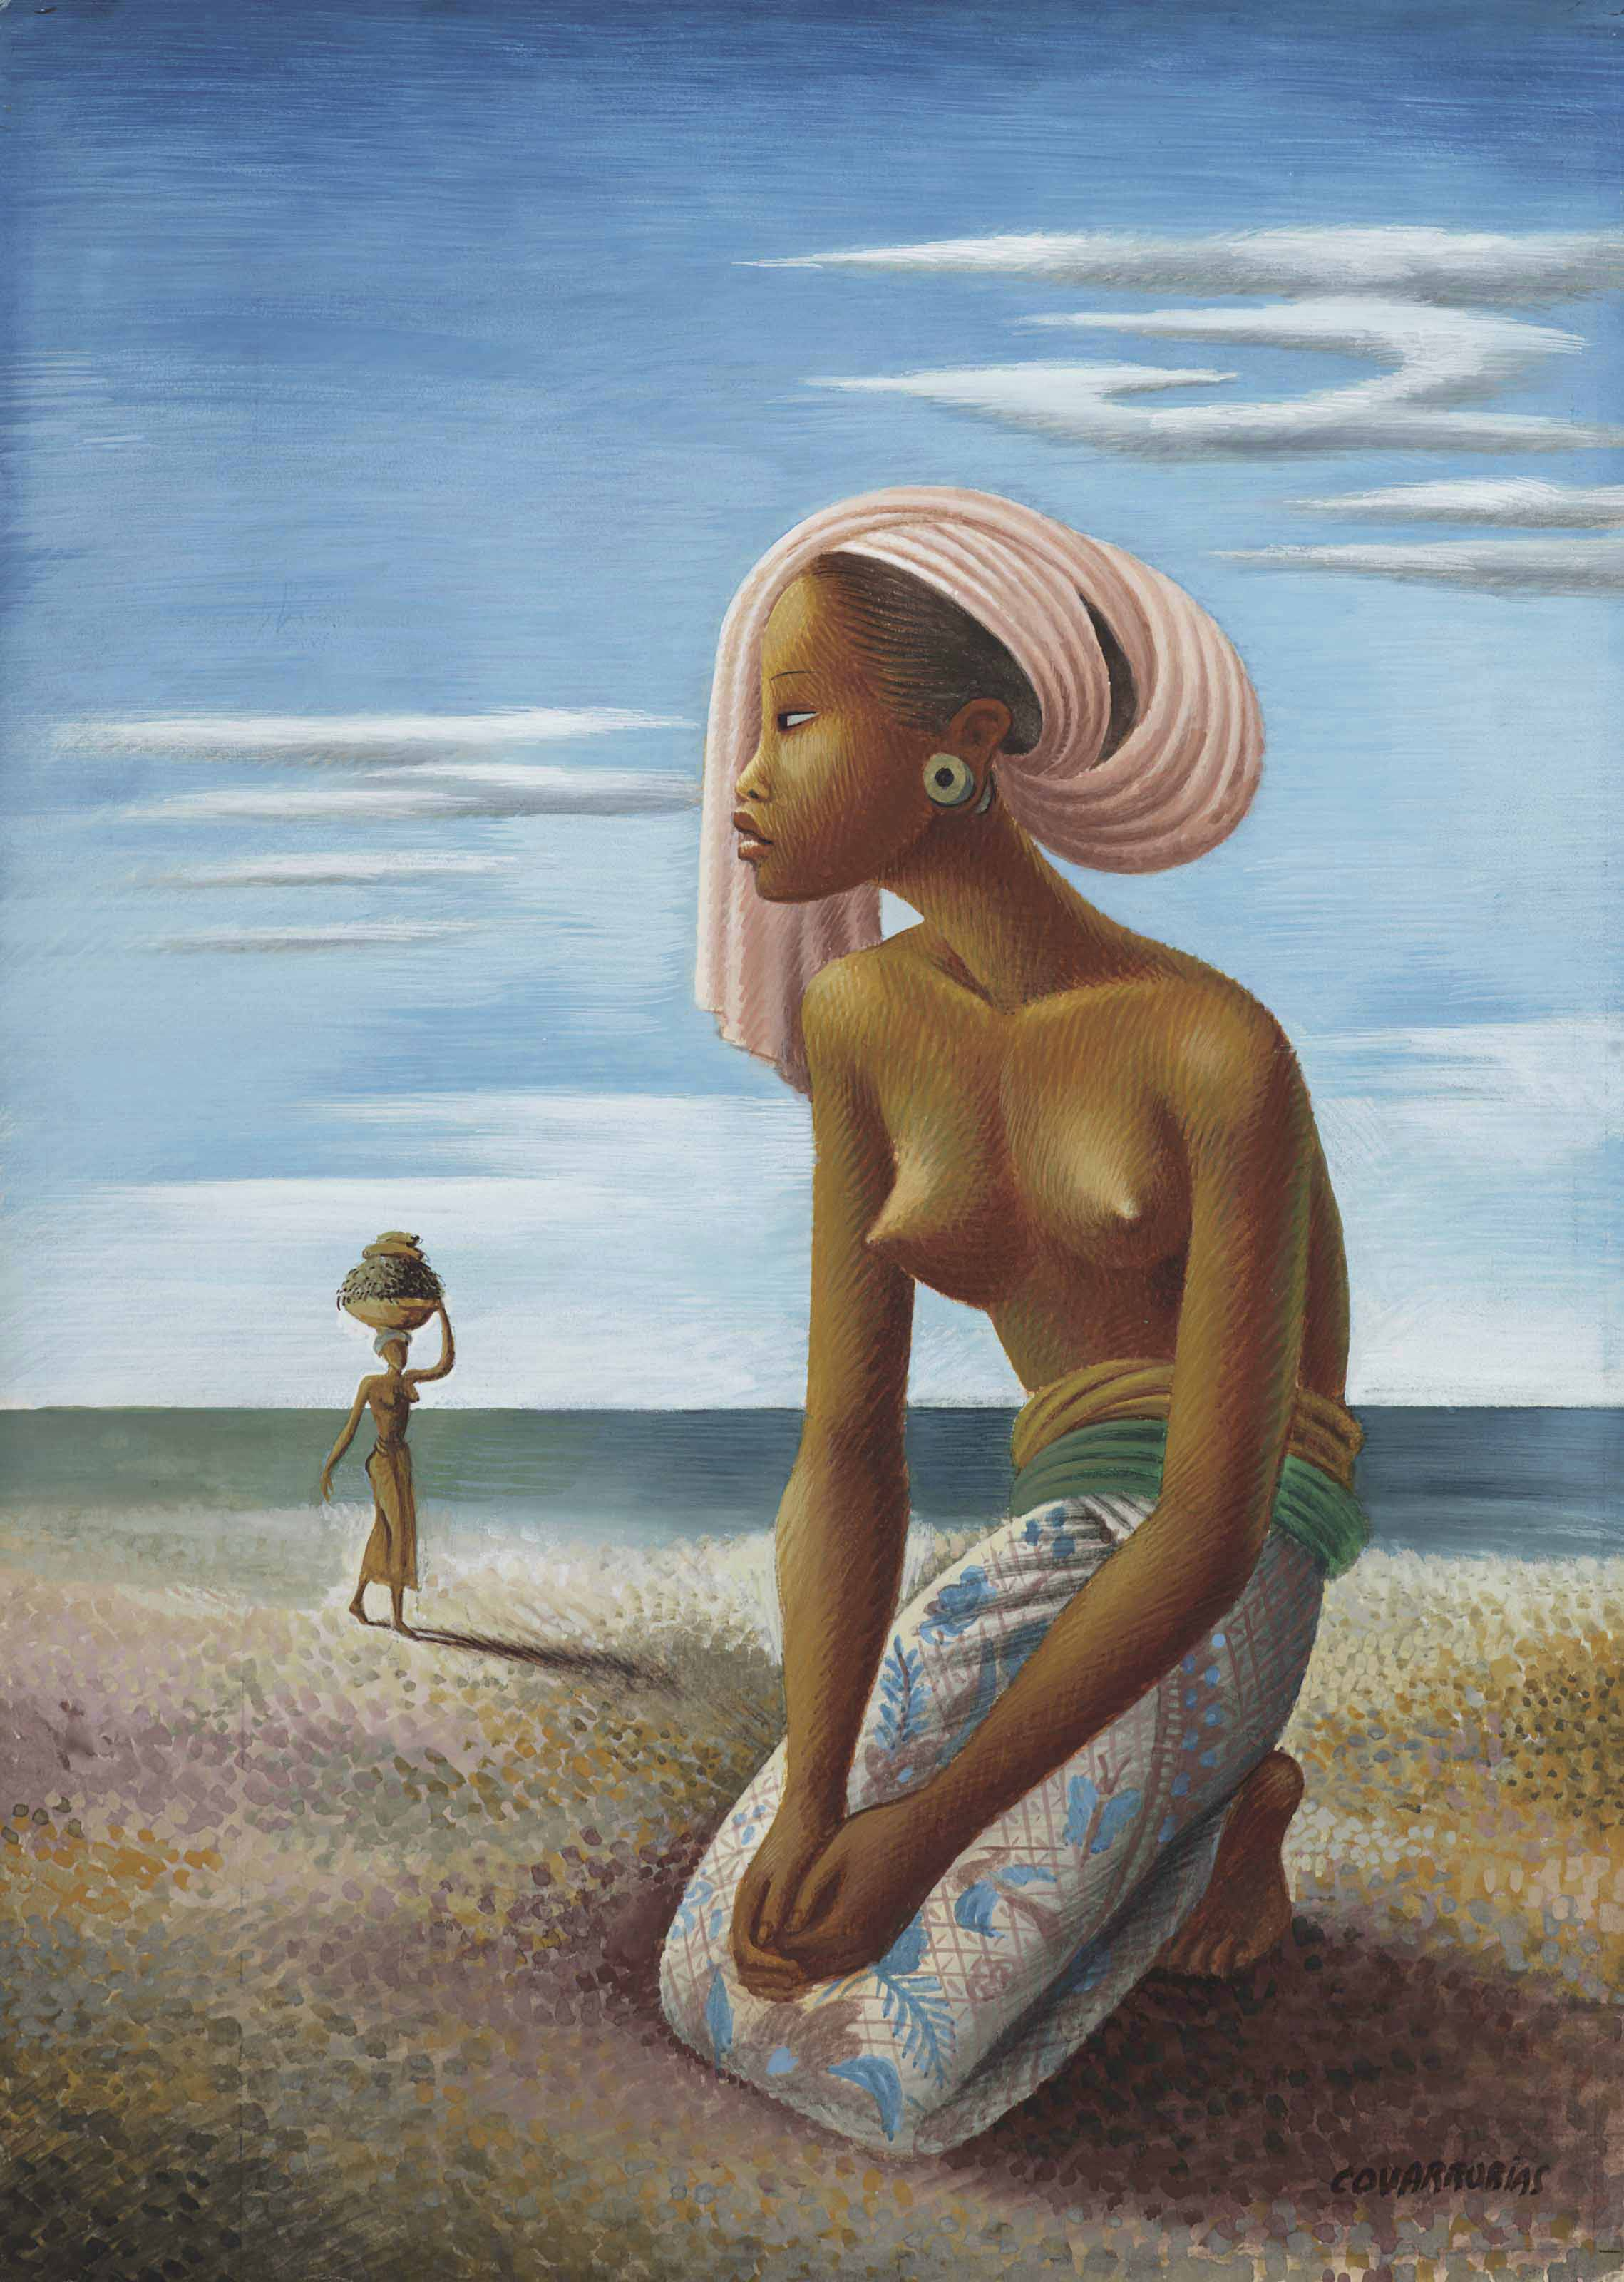 Girl Wearing a Sarong by the Ocean (also known as Balinesa con turbante rosa en la playa)